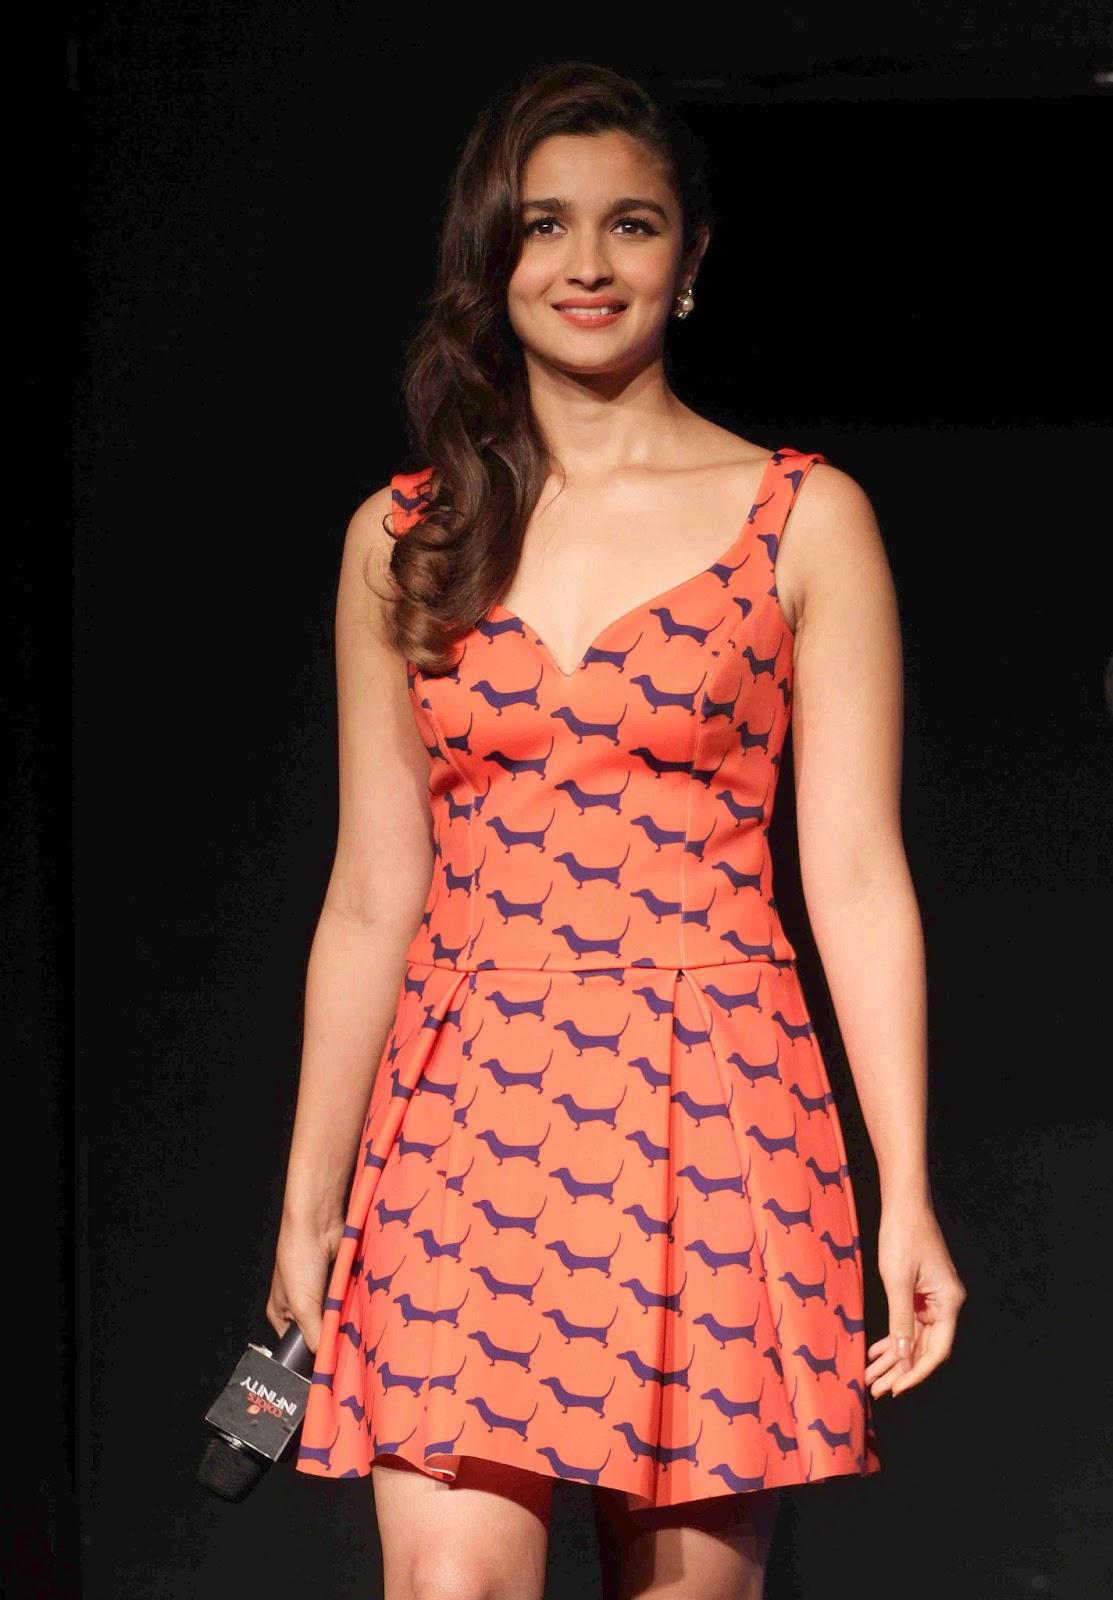 Alia Bhatt Hot Leg Show Photos In Orange Dress